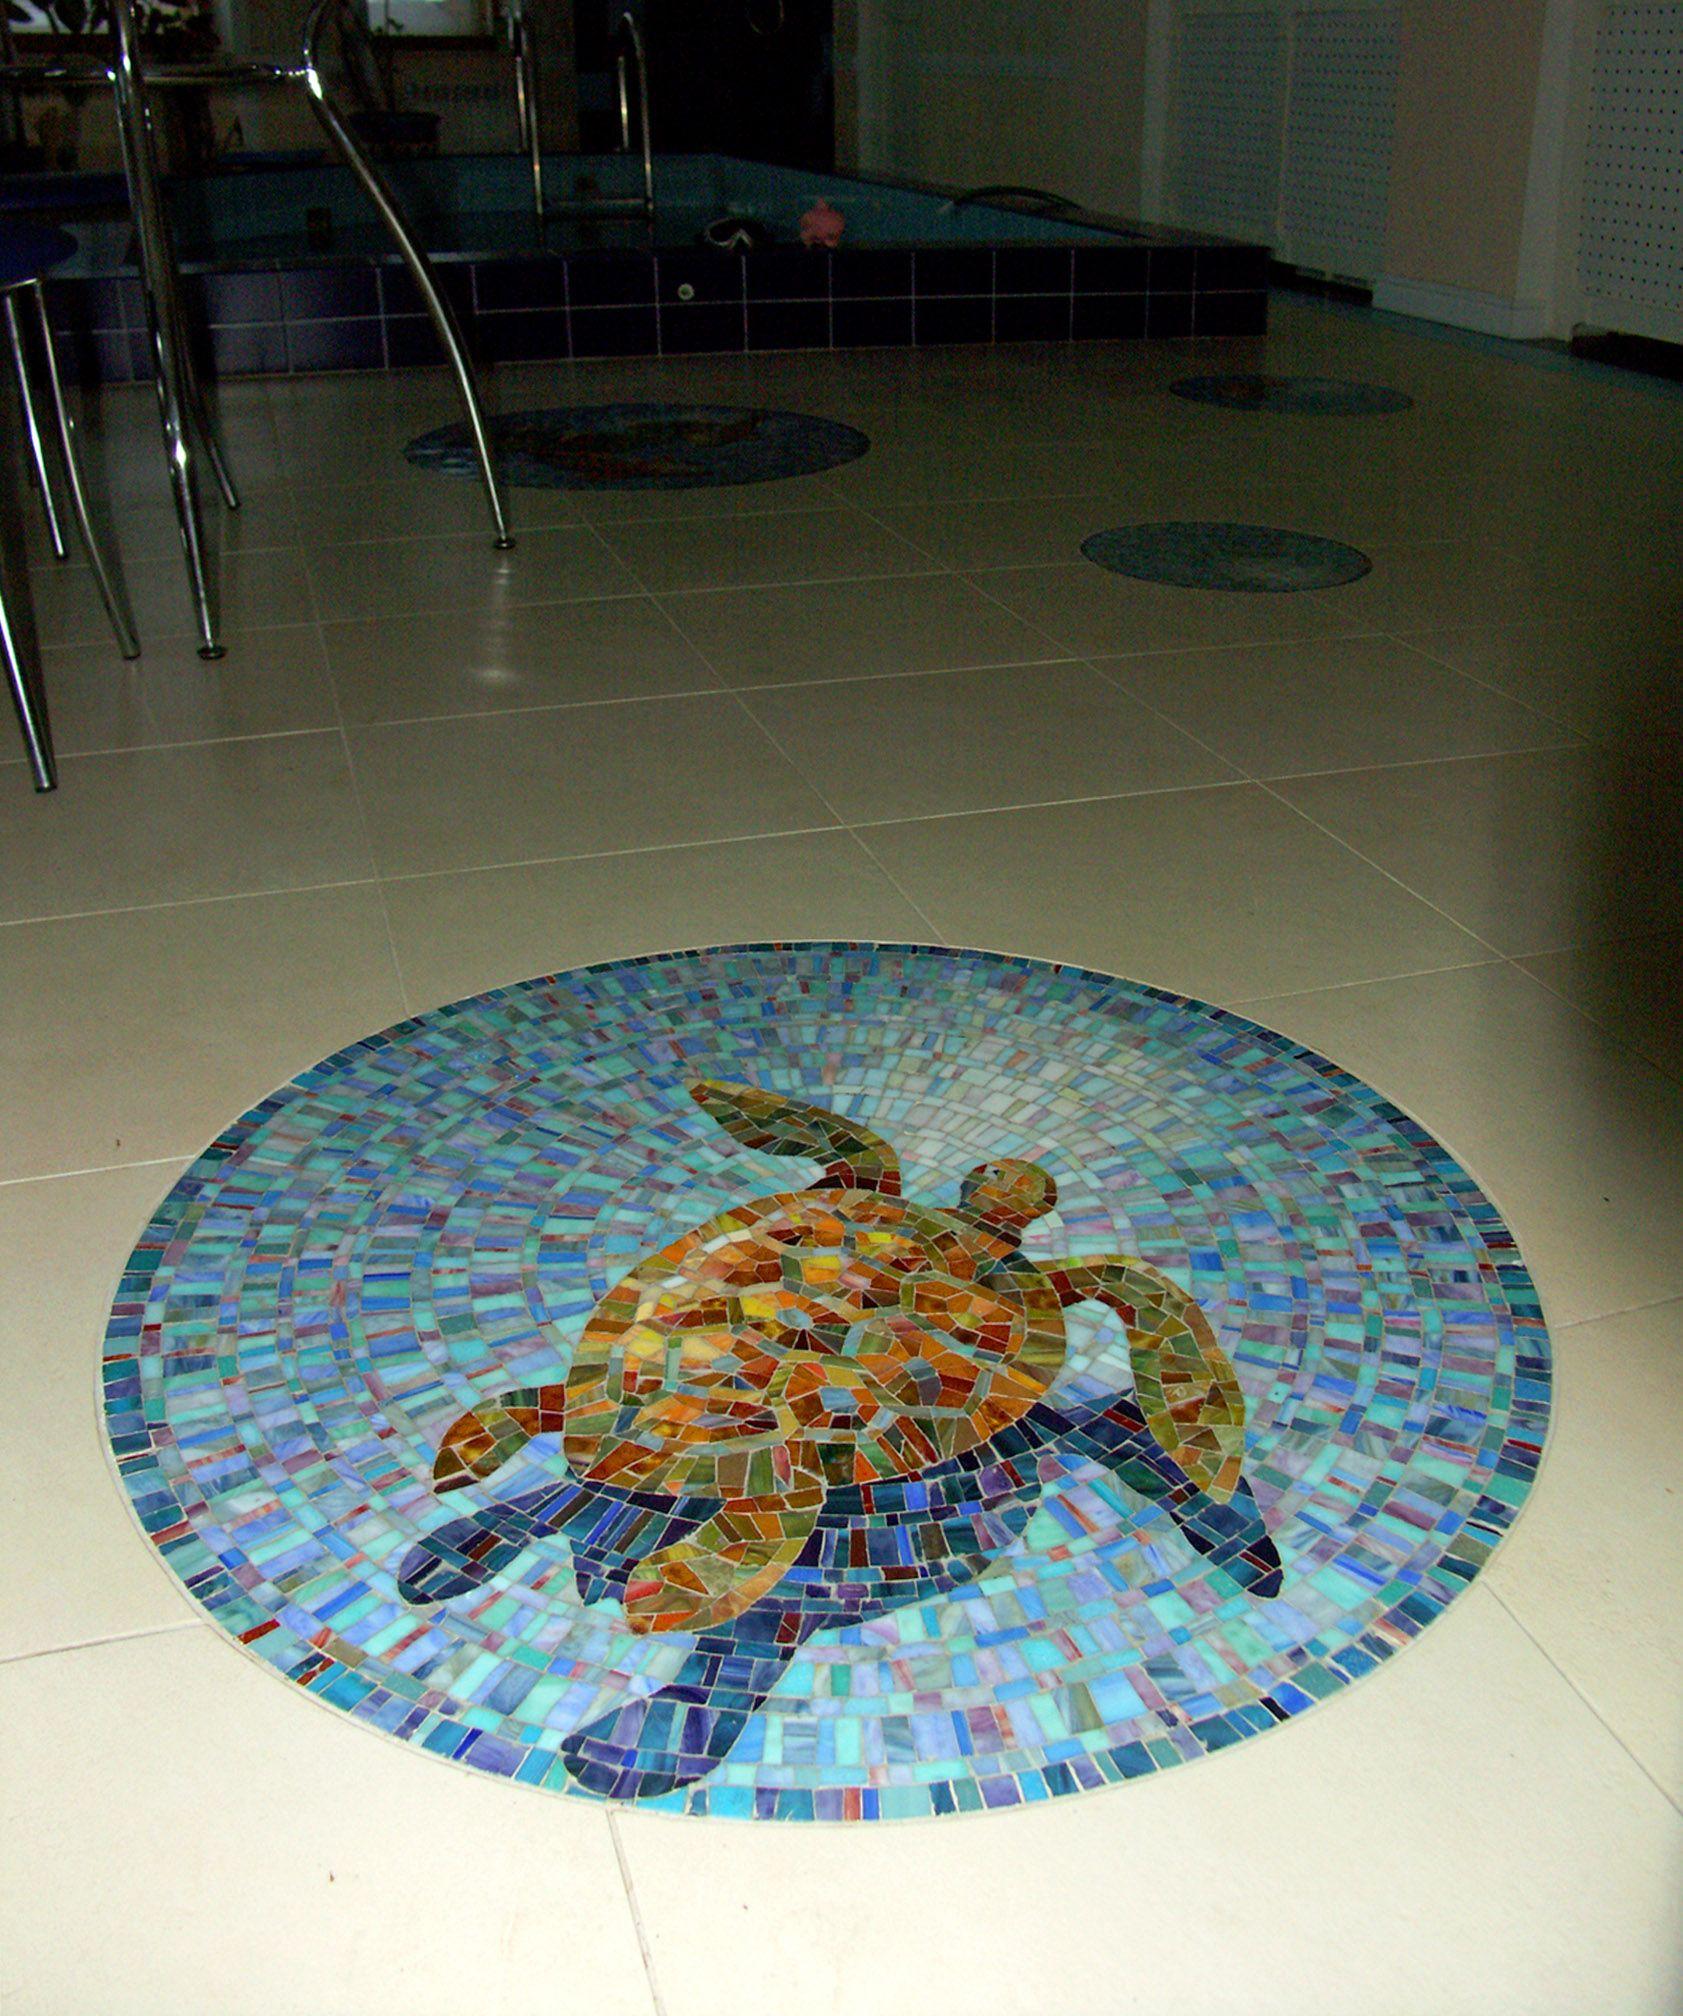 Mosaic insert in the floor | Mosaic patterns | Pinterest | Mosaics ...